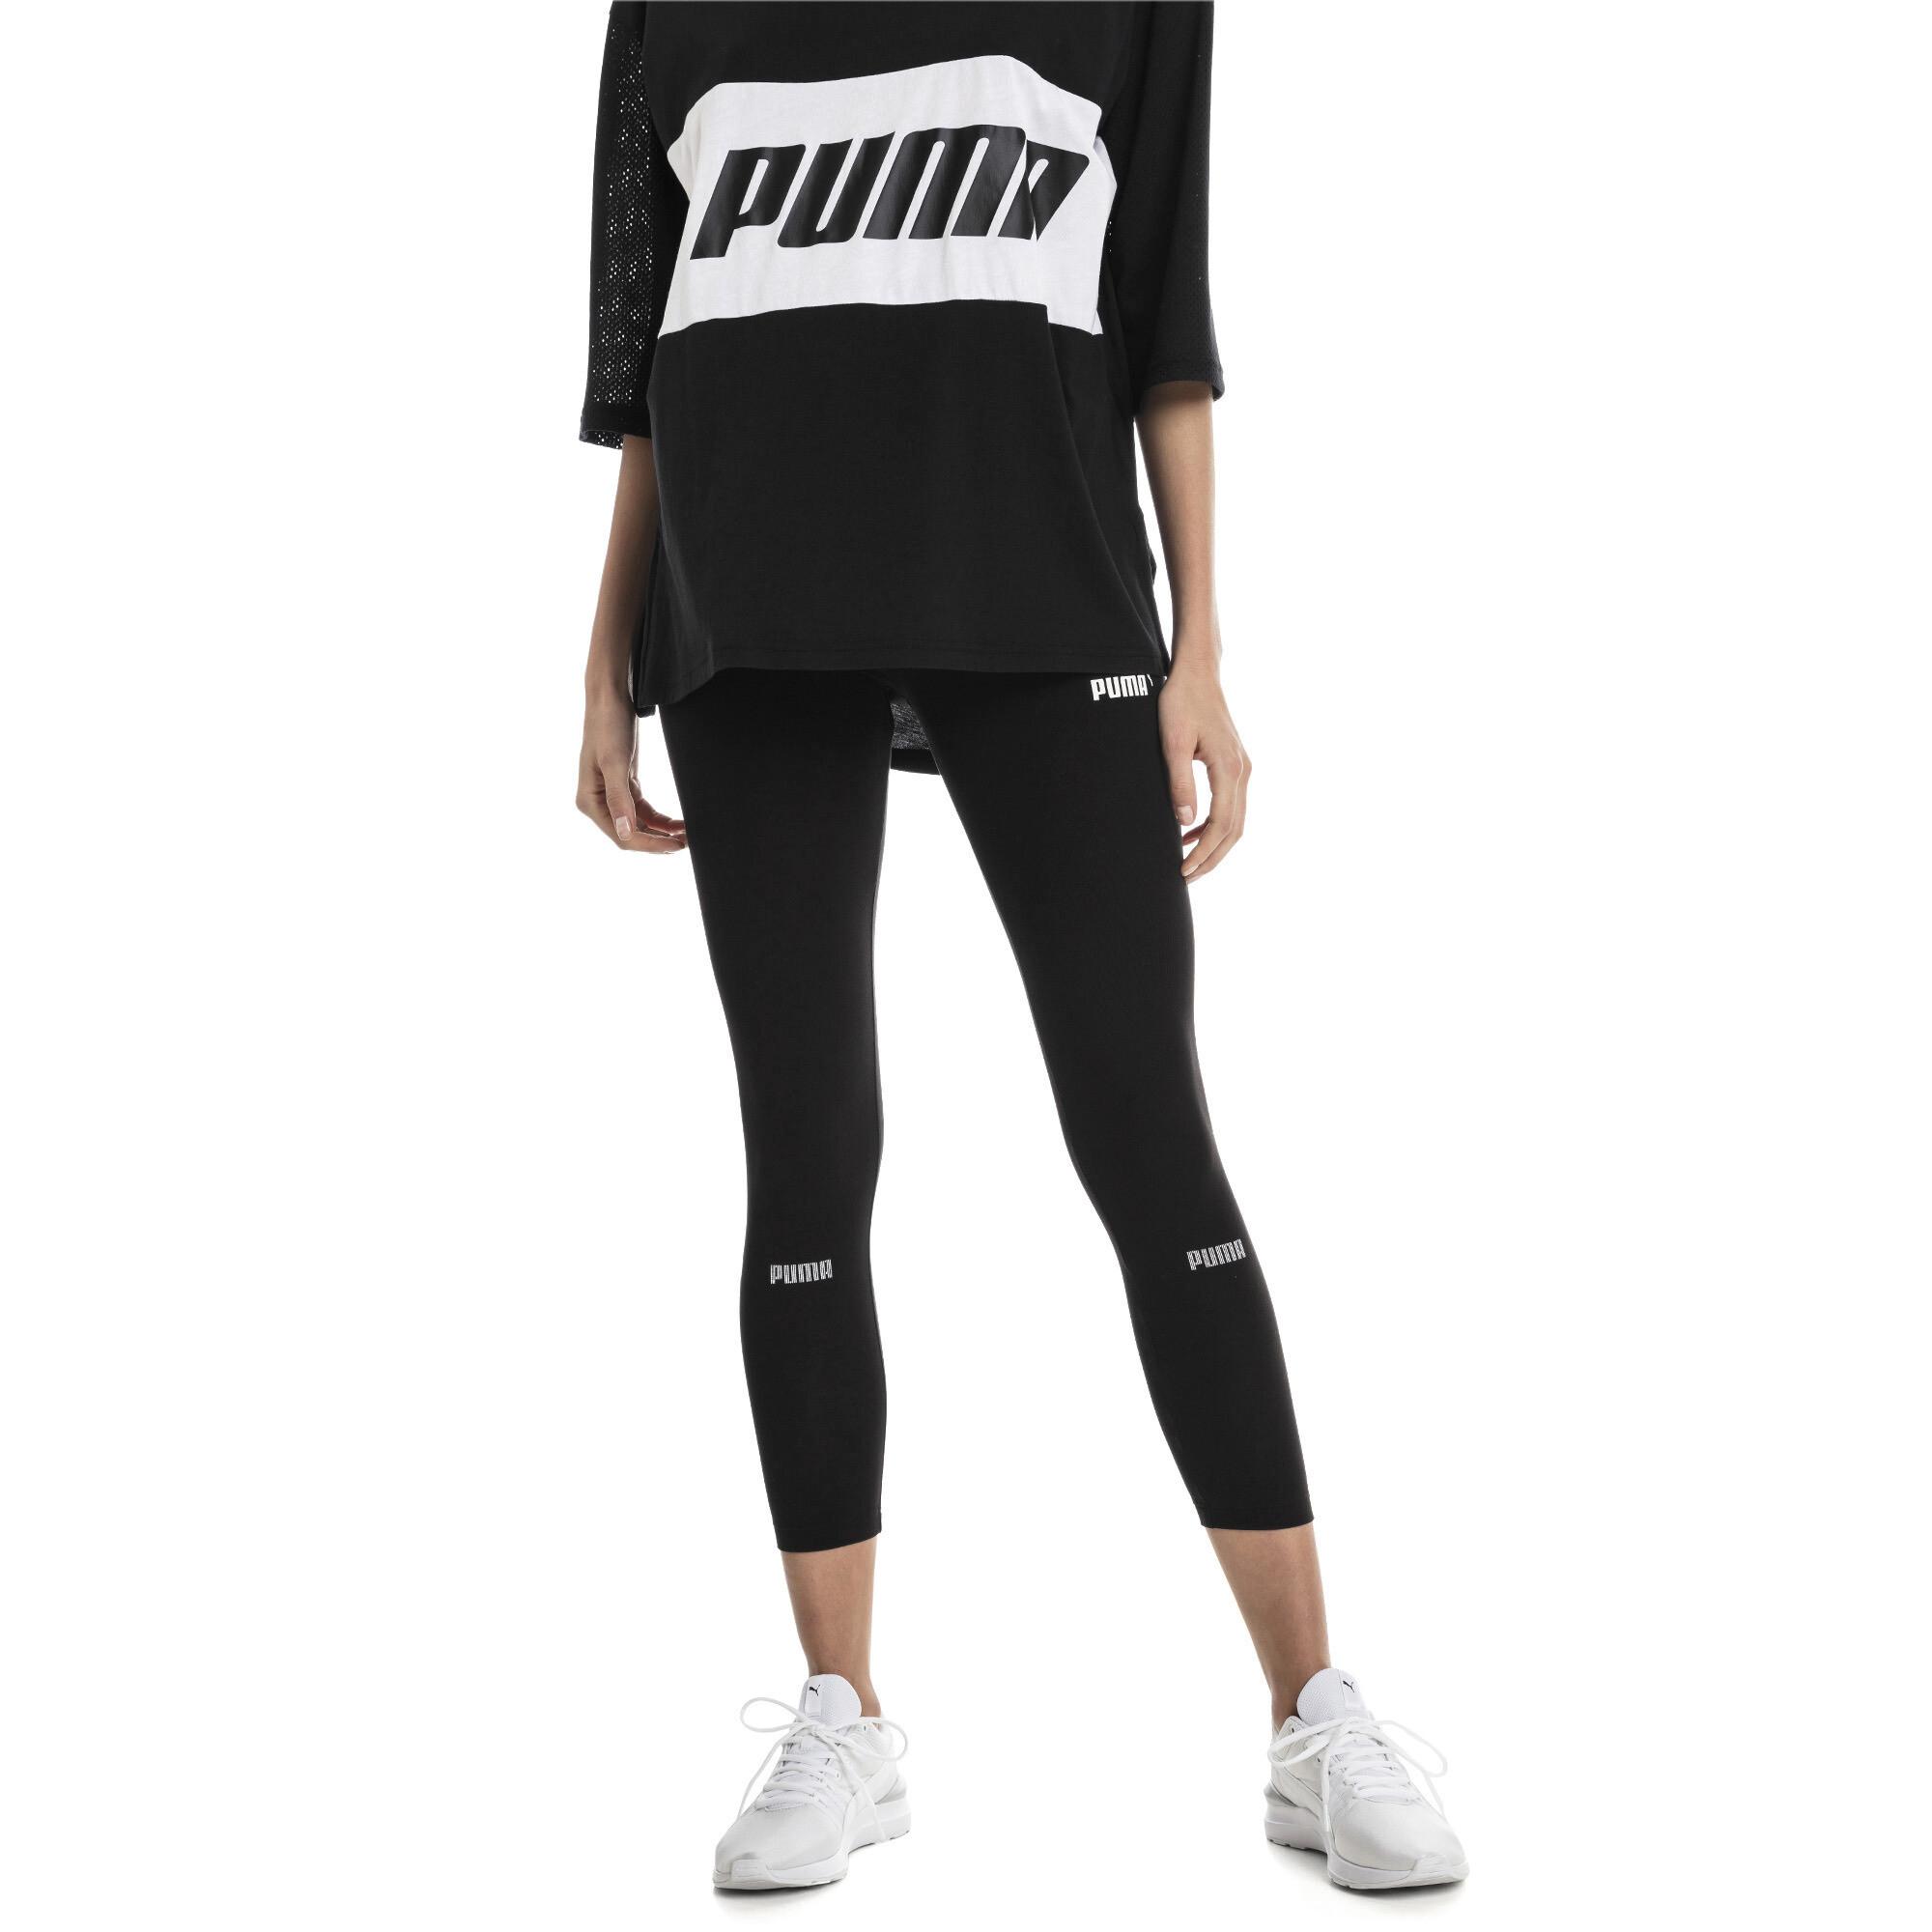 Puma Amplified Womens Ladies Sports Fitness Legging Black Activewear Tops